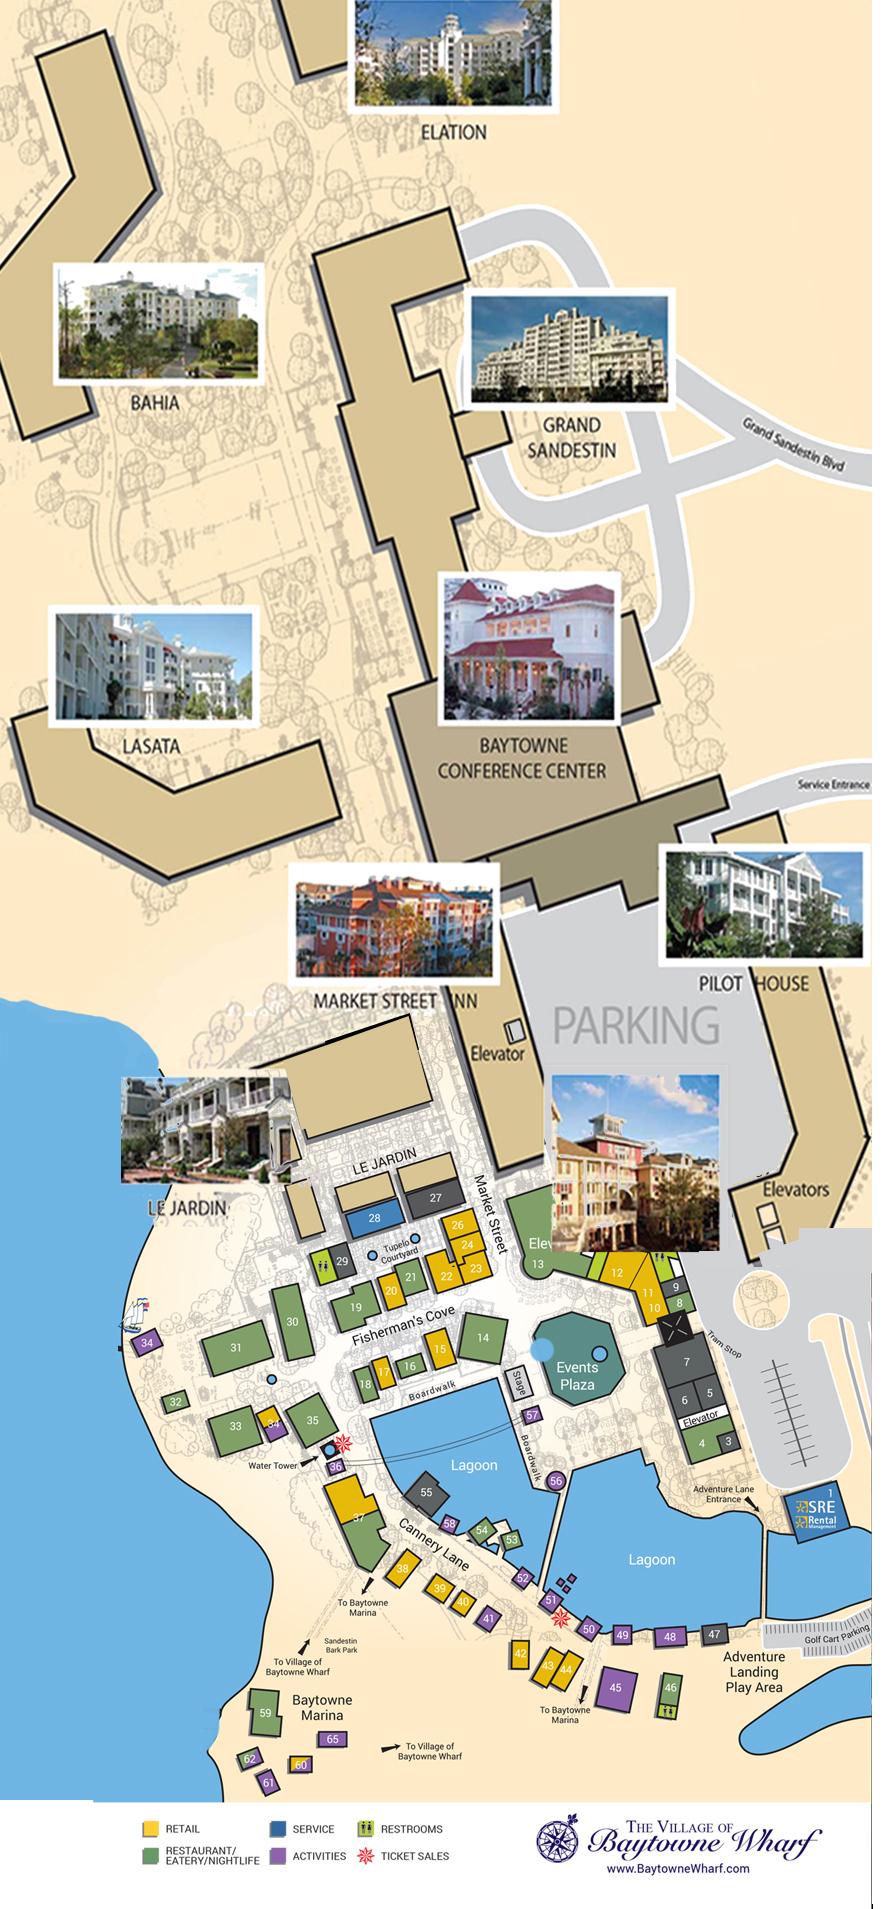 Village Map | The Village Of Baytowne Wharf | Located In Sandestin - Google Maps Destin Florida